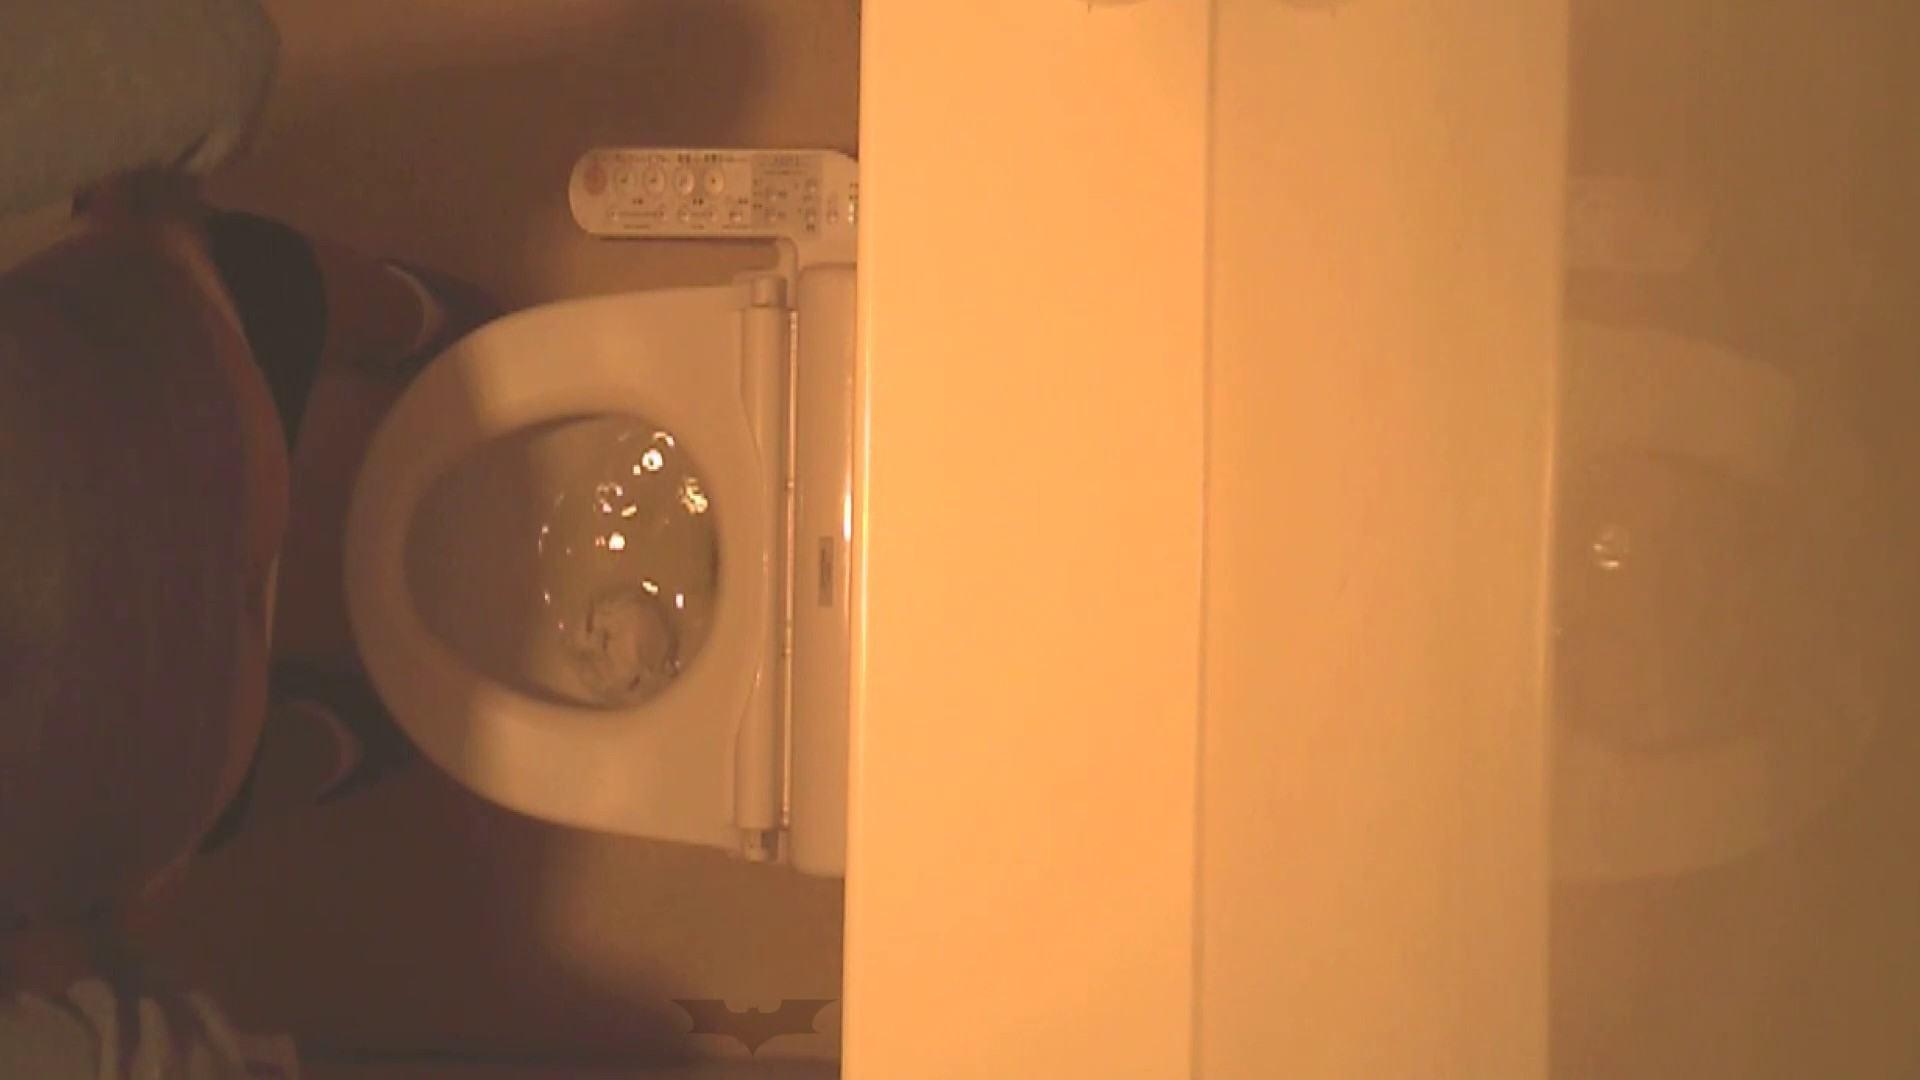 潜入!!全国女子洗面所盗撮 Vol.07 投稿 セックス画像 110画像 78